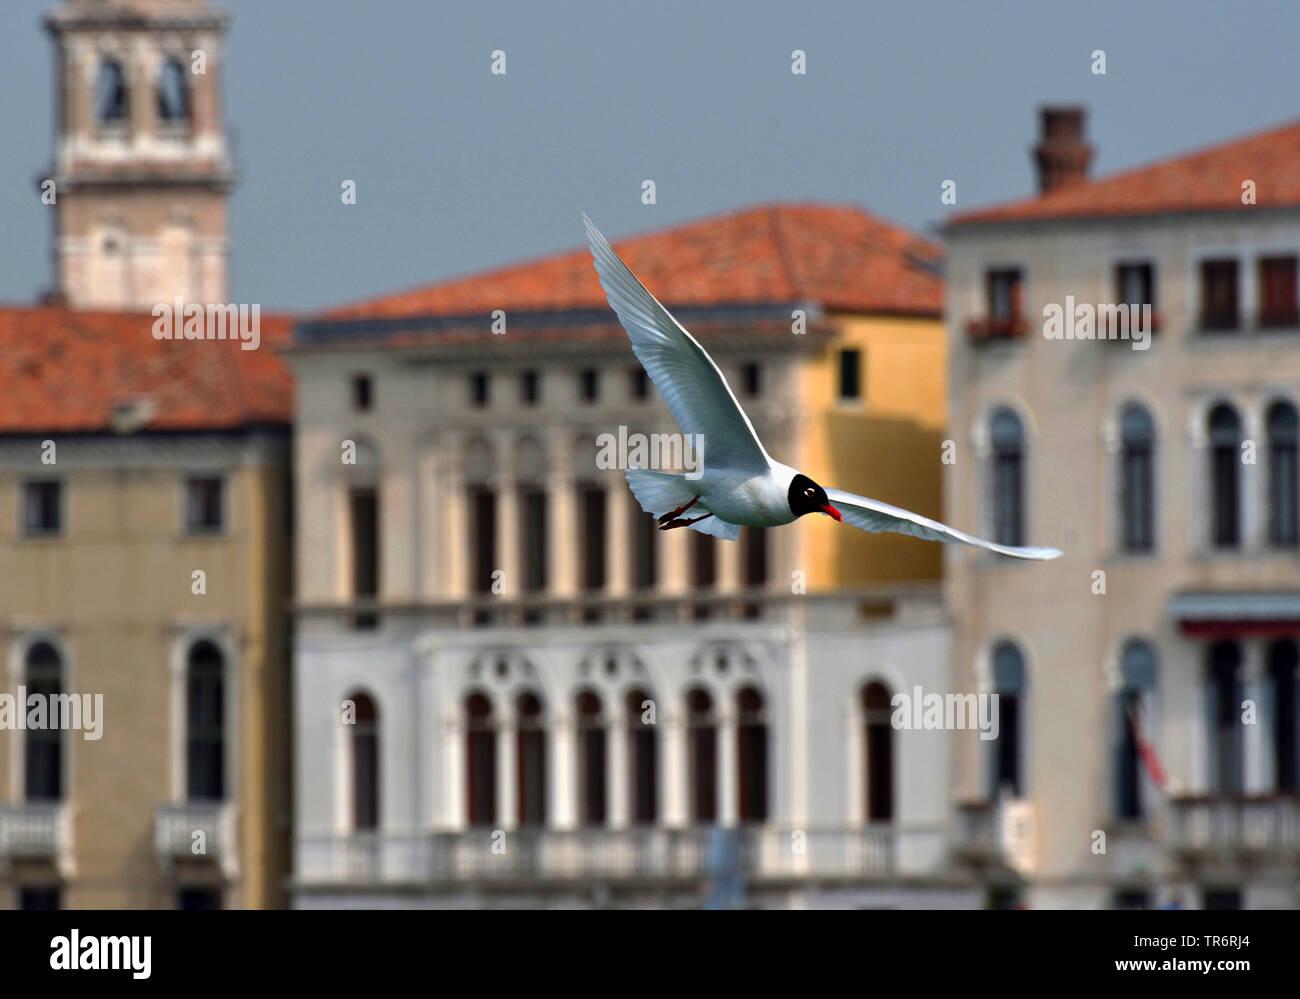 Schwarzkopfmoewe, Schwarzkopf-Moewe (Larus melanocephalus, Ichthyaetus melanocephalus), fliegend in Venedig, Italien, Venedig | mediterranean gull (La - Stock Image